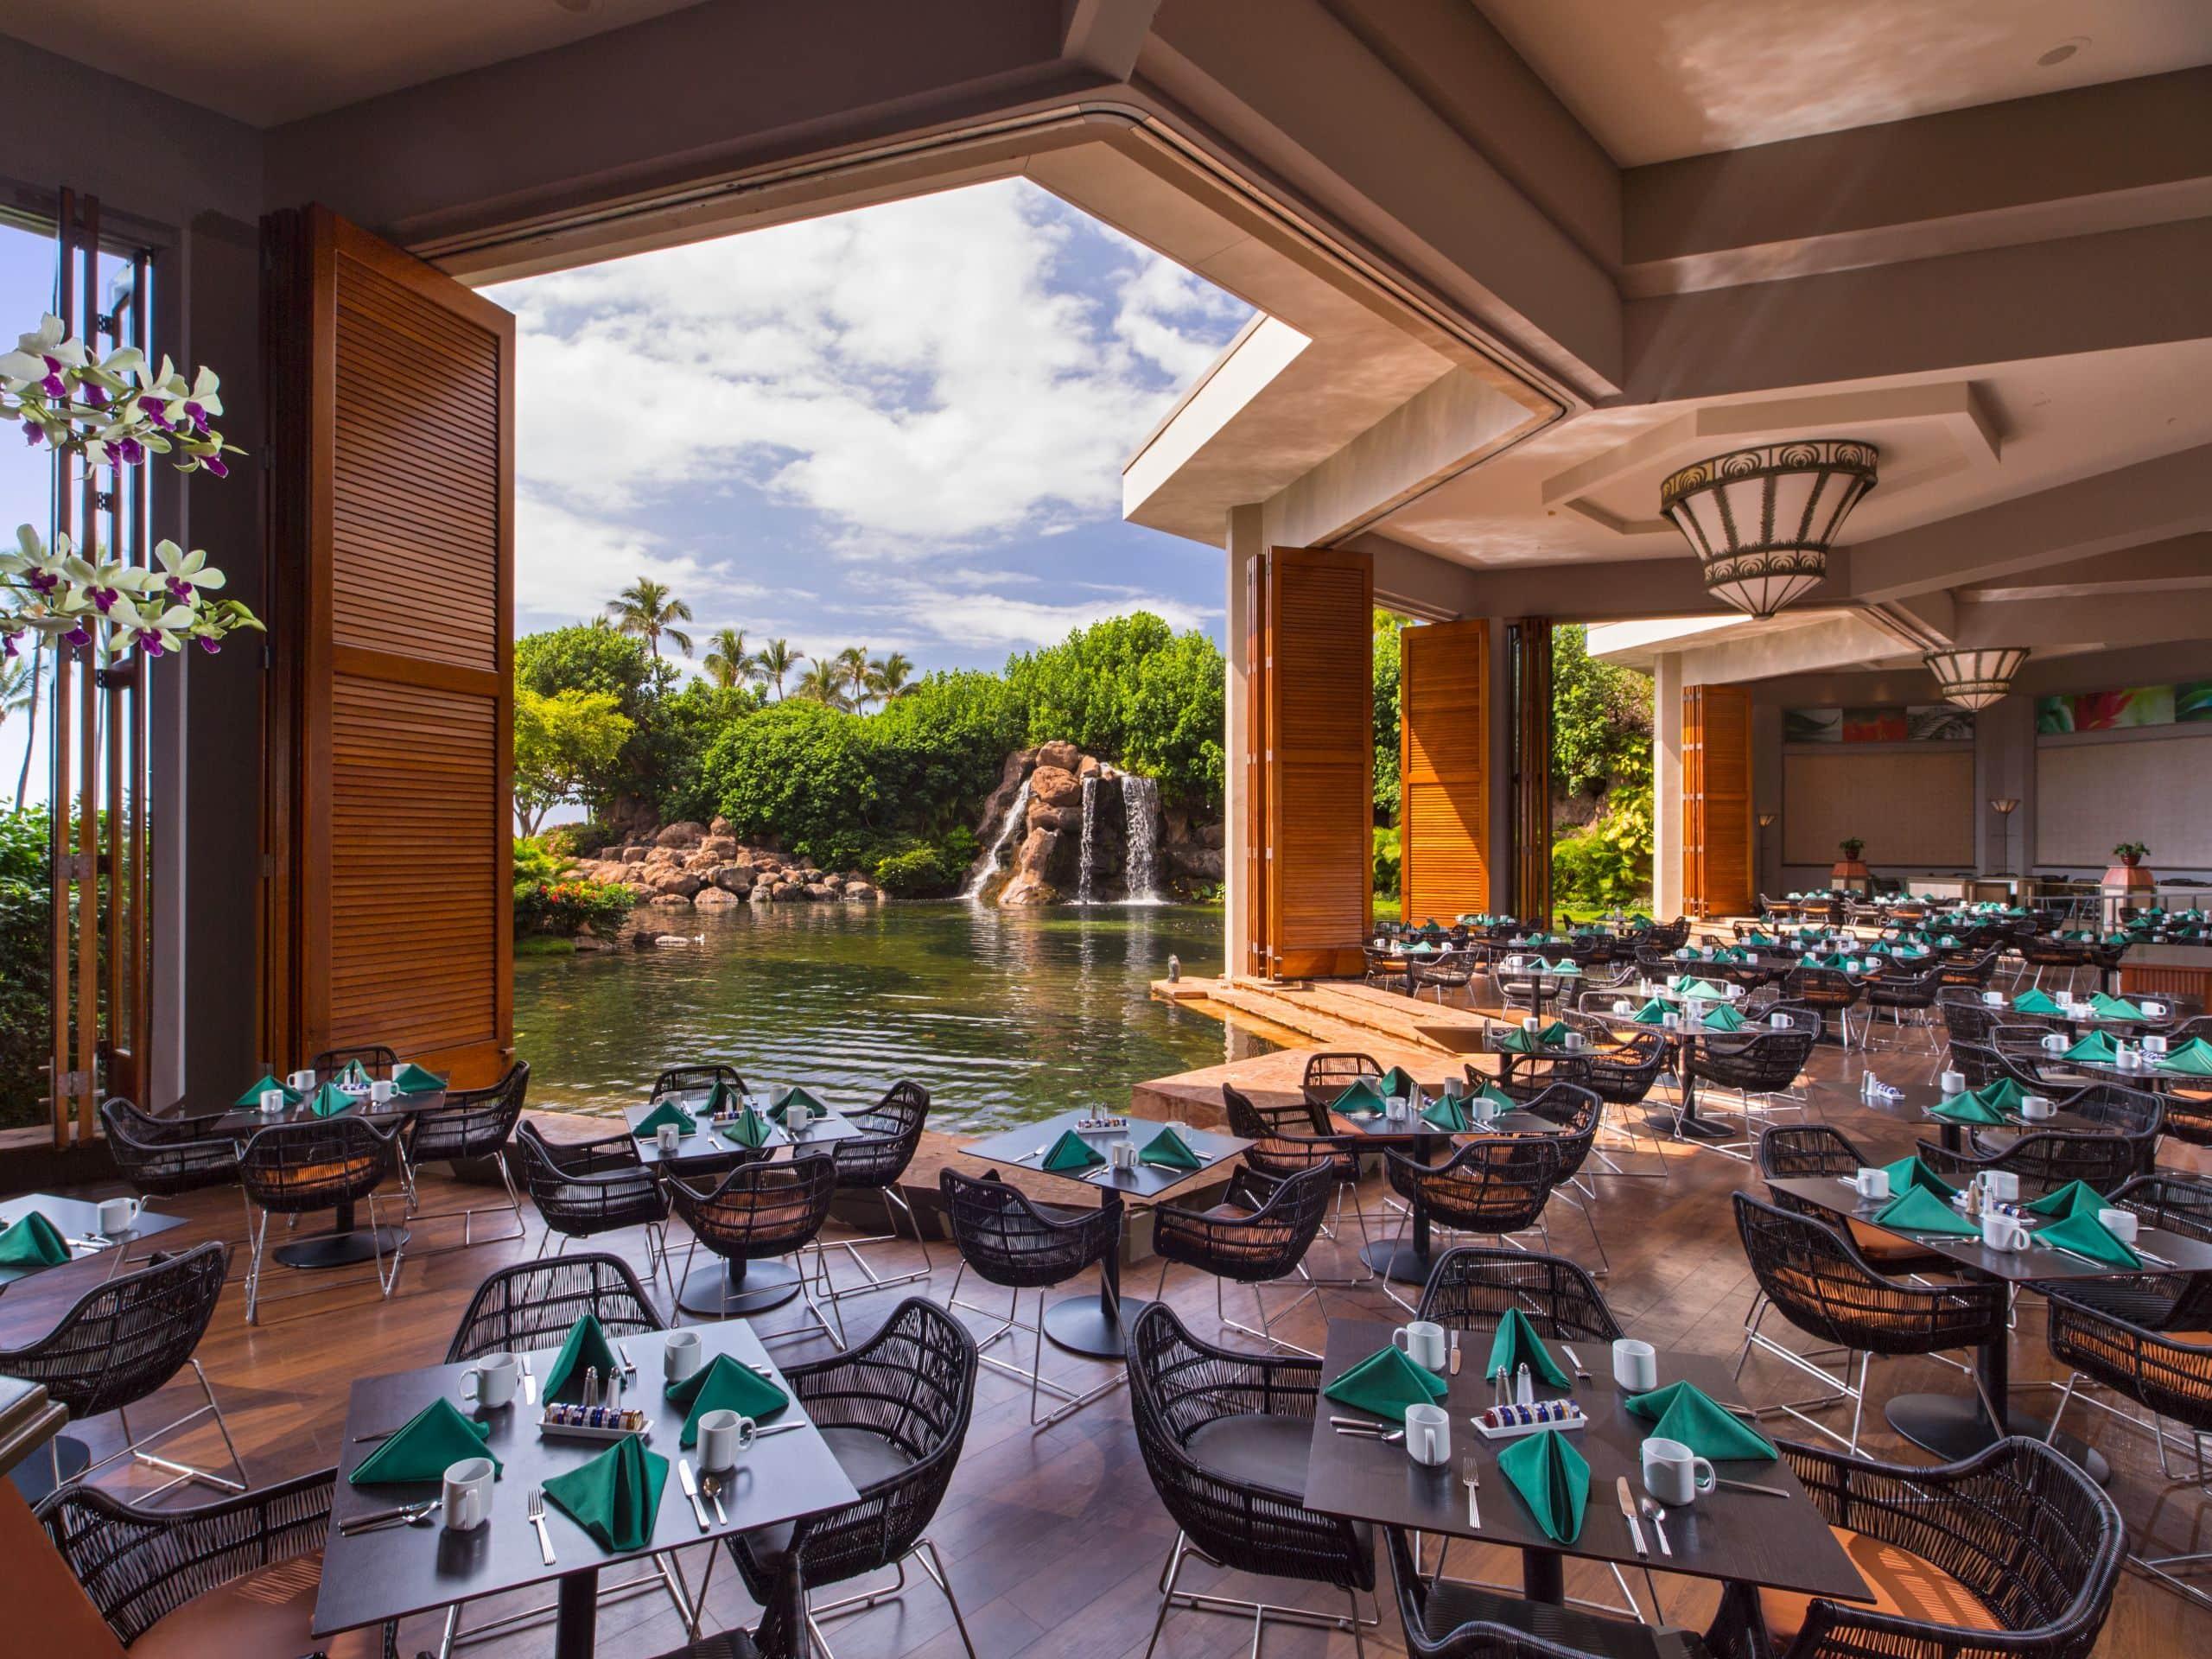 Restaurants Bars And Places To Eat In Maui Hyatt Regency Resort Spa